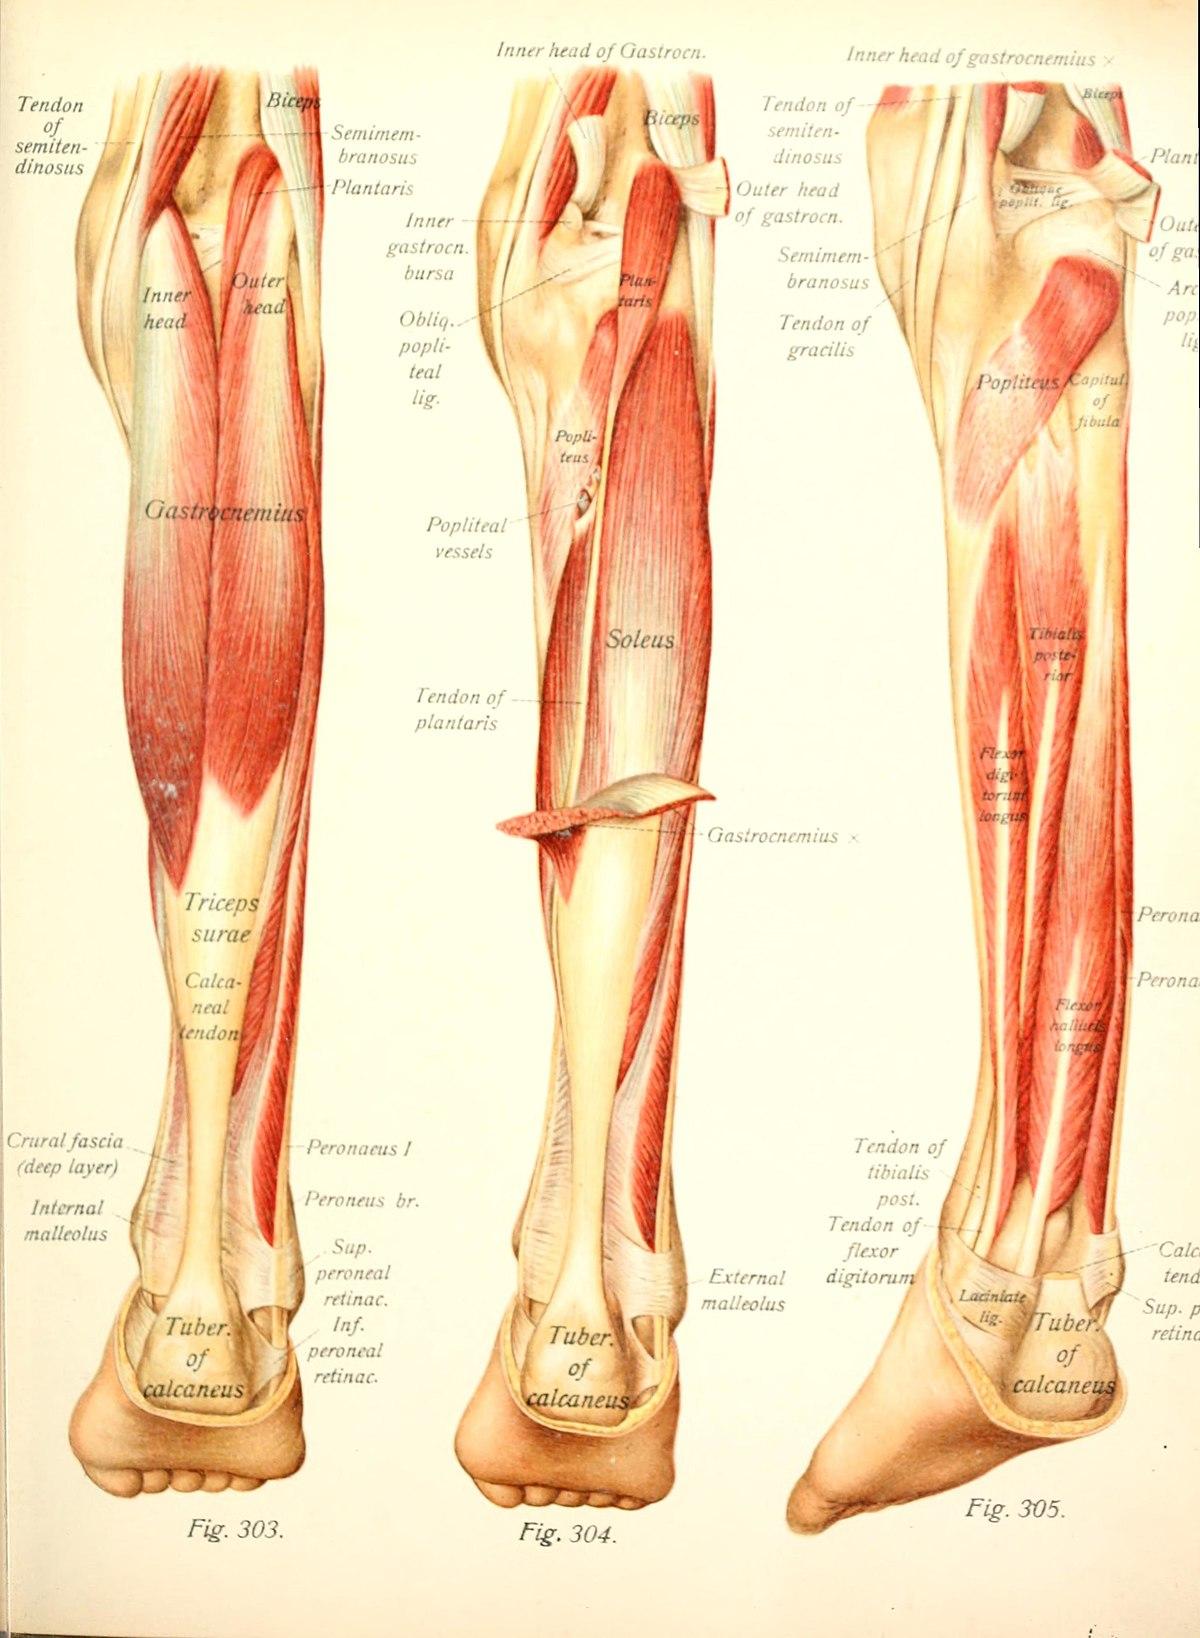 tendon de biceps crural